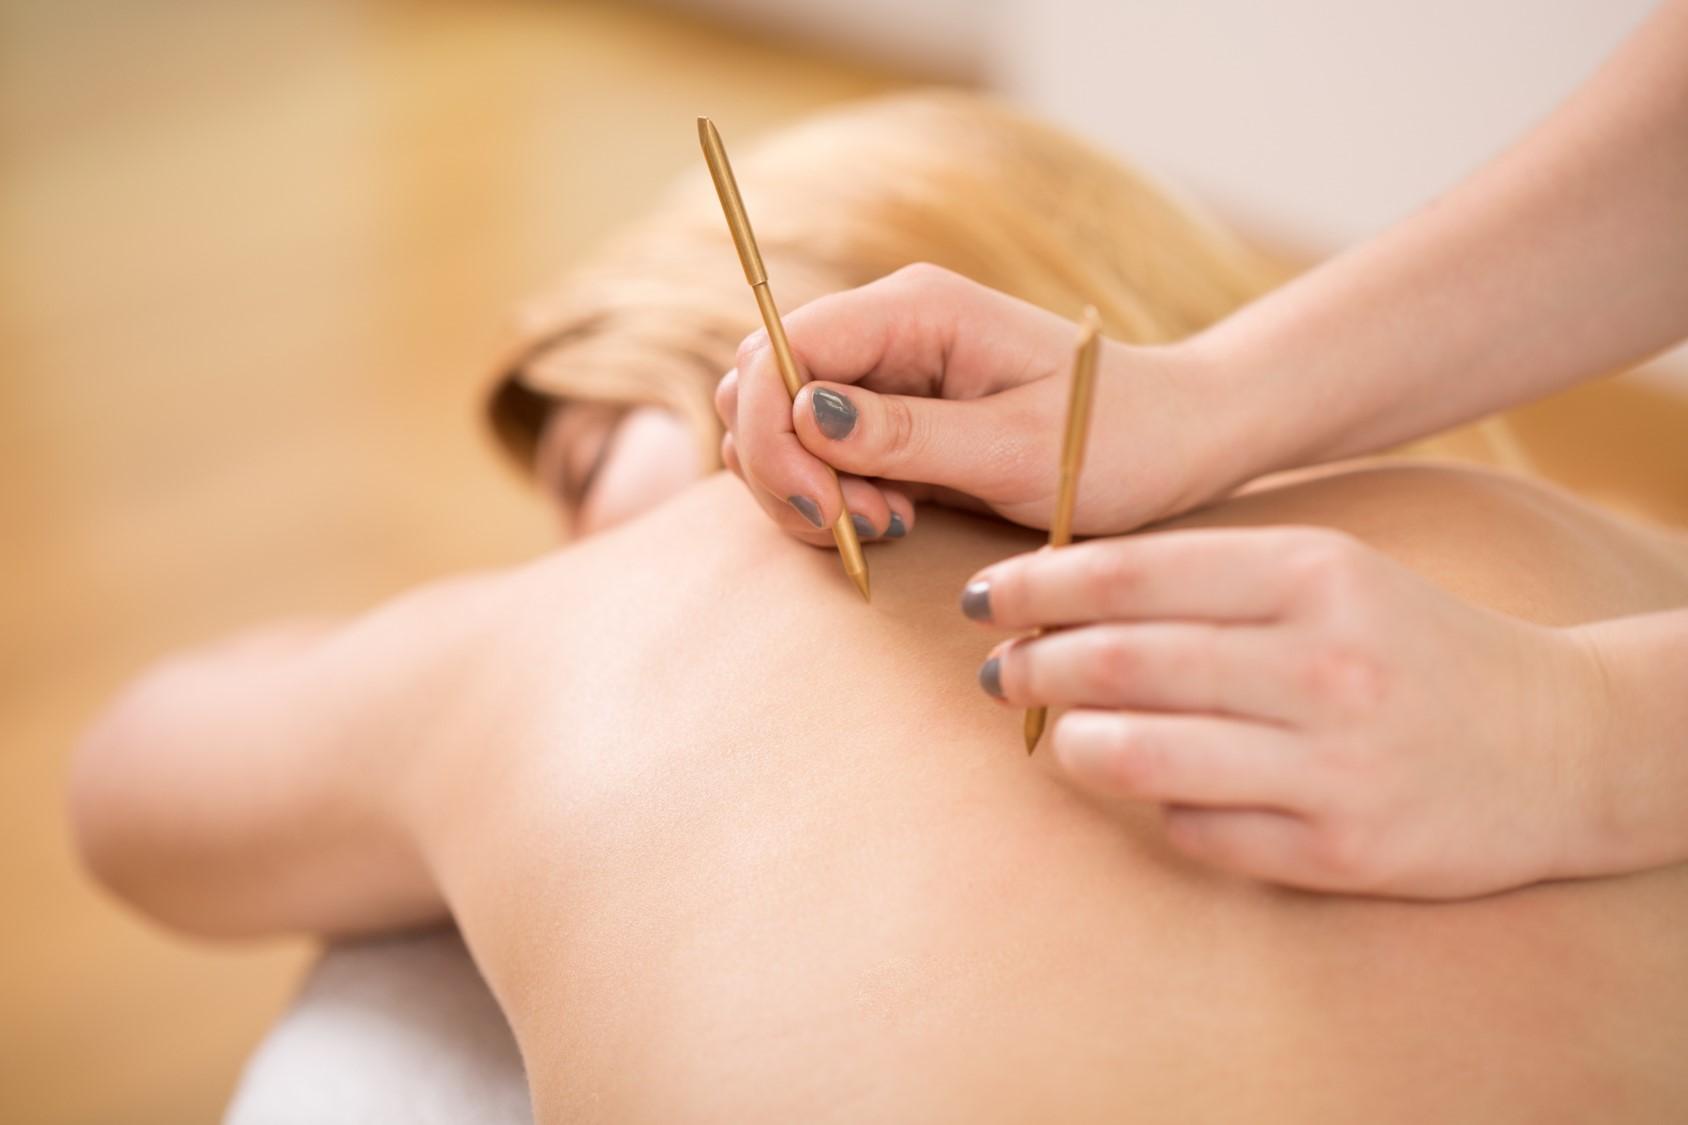 Xinhua Treatments